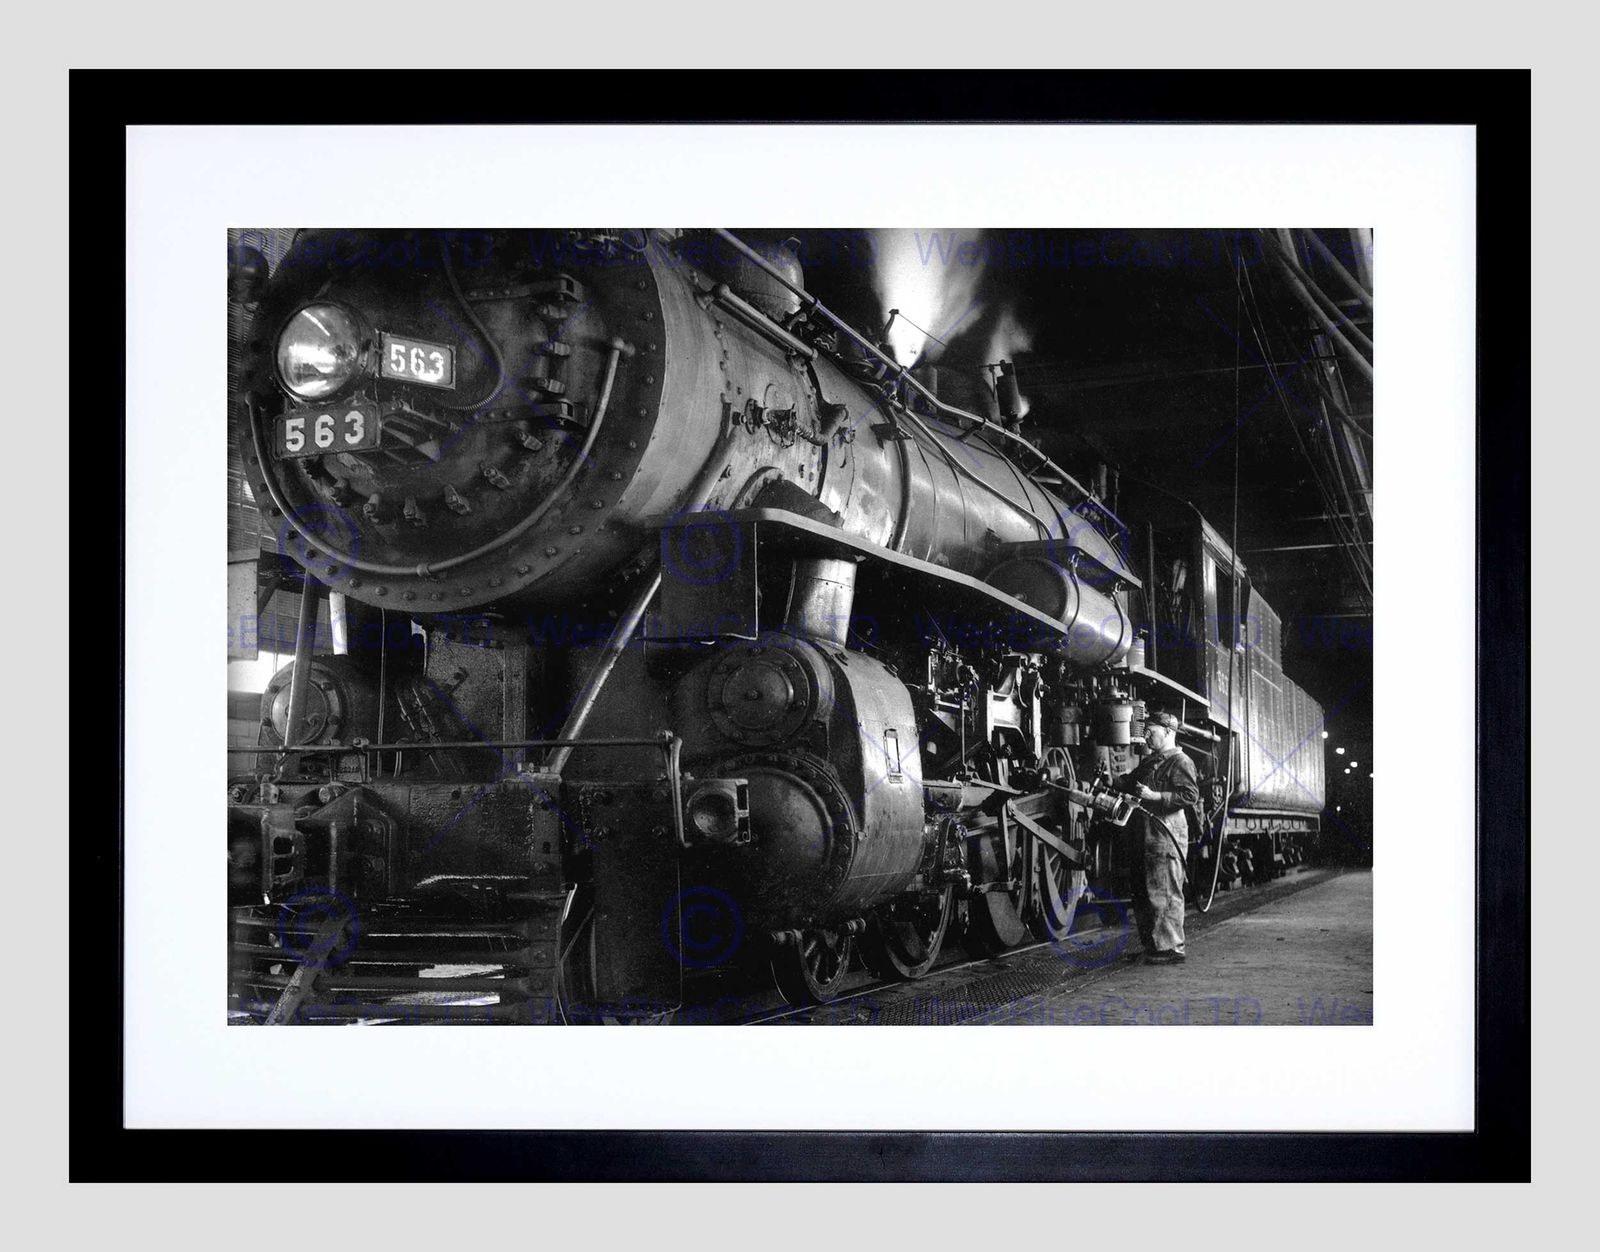 85543 1955 STEAM TRAIN WINSTON LINK ENGINE NEW MOUNT Decor WALL PRINT POSTER CA